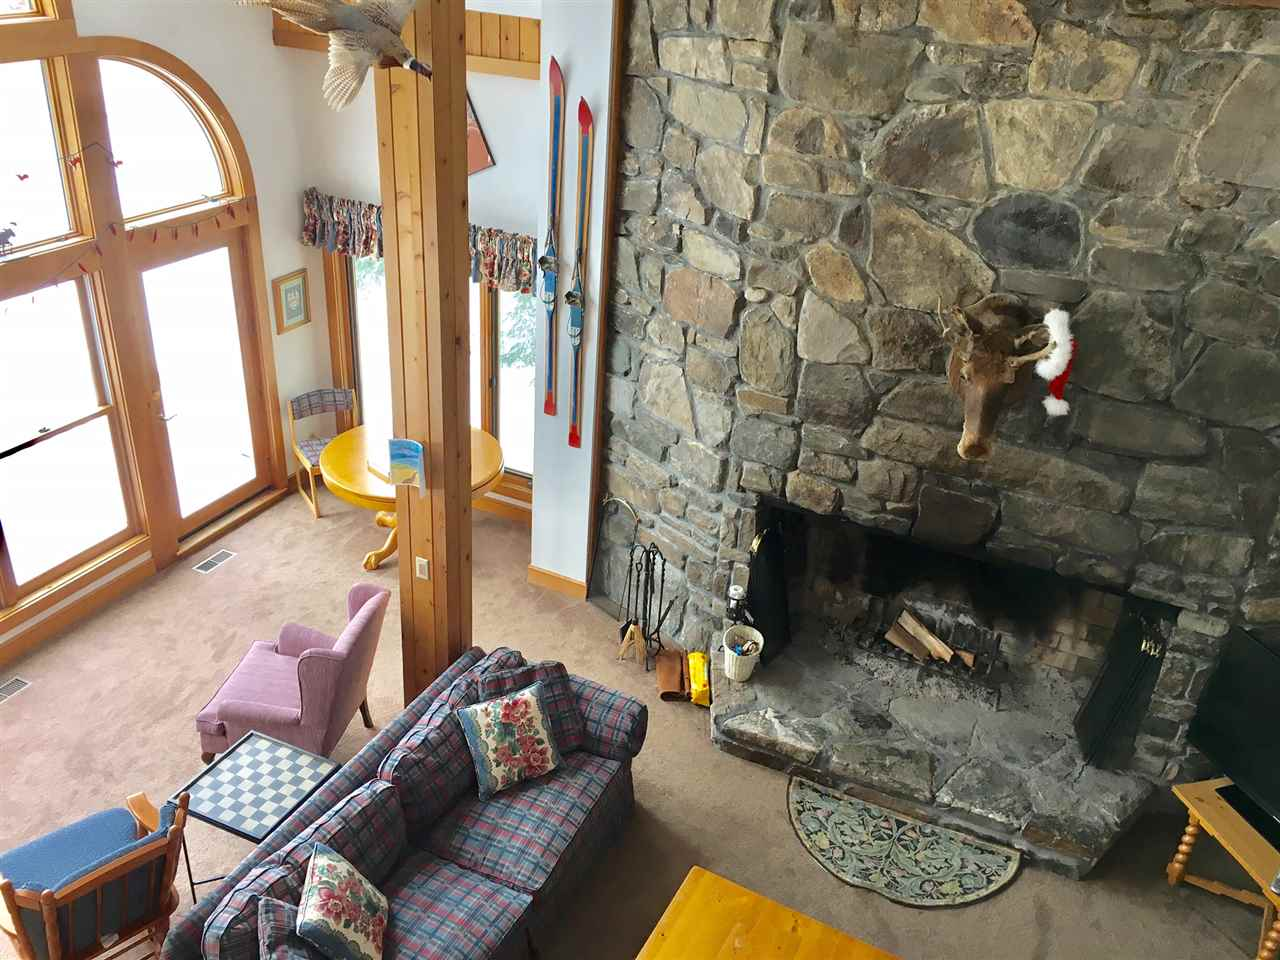 Mount-Snow-Real-Estate-4614113-5